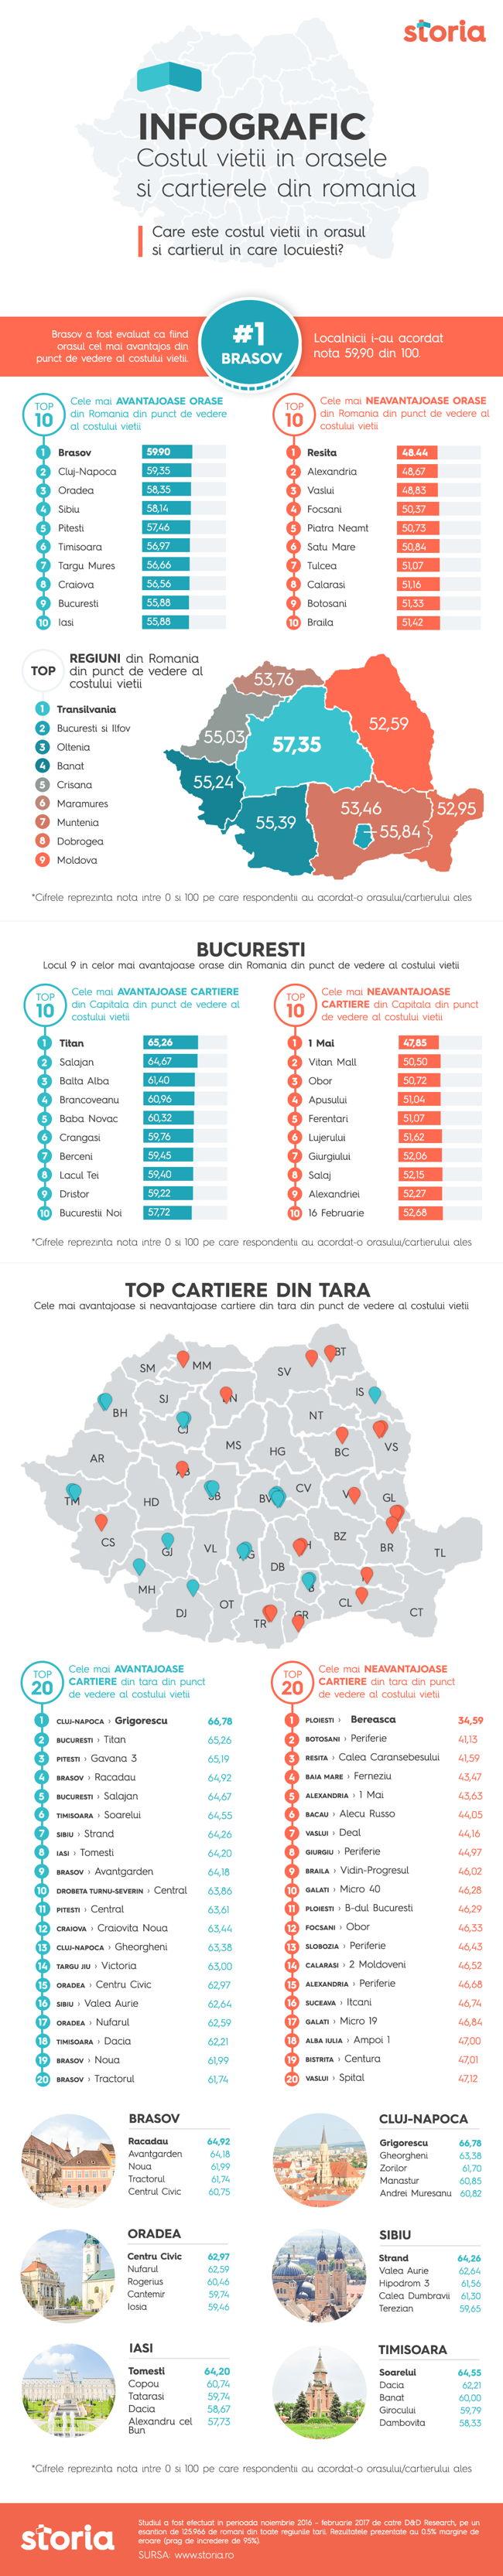 Infographic_Costul_Vietii_Storia.ro